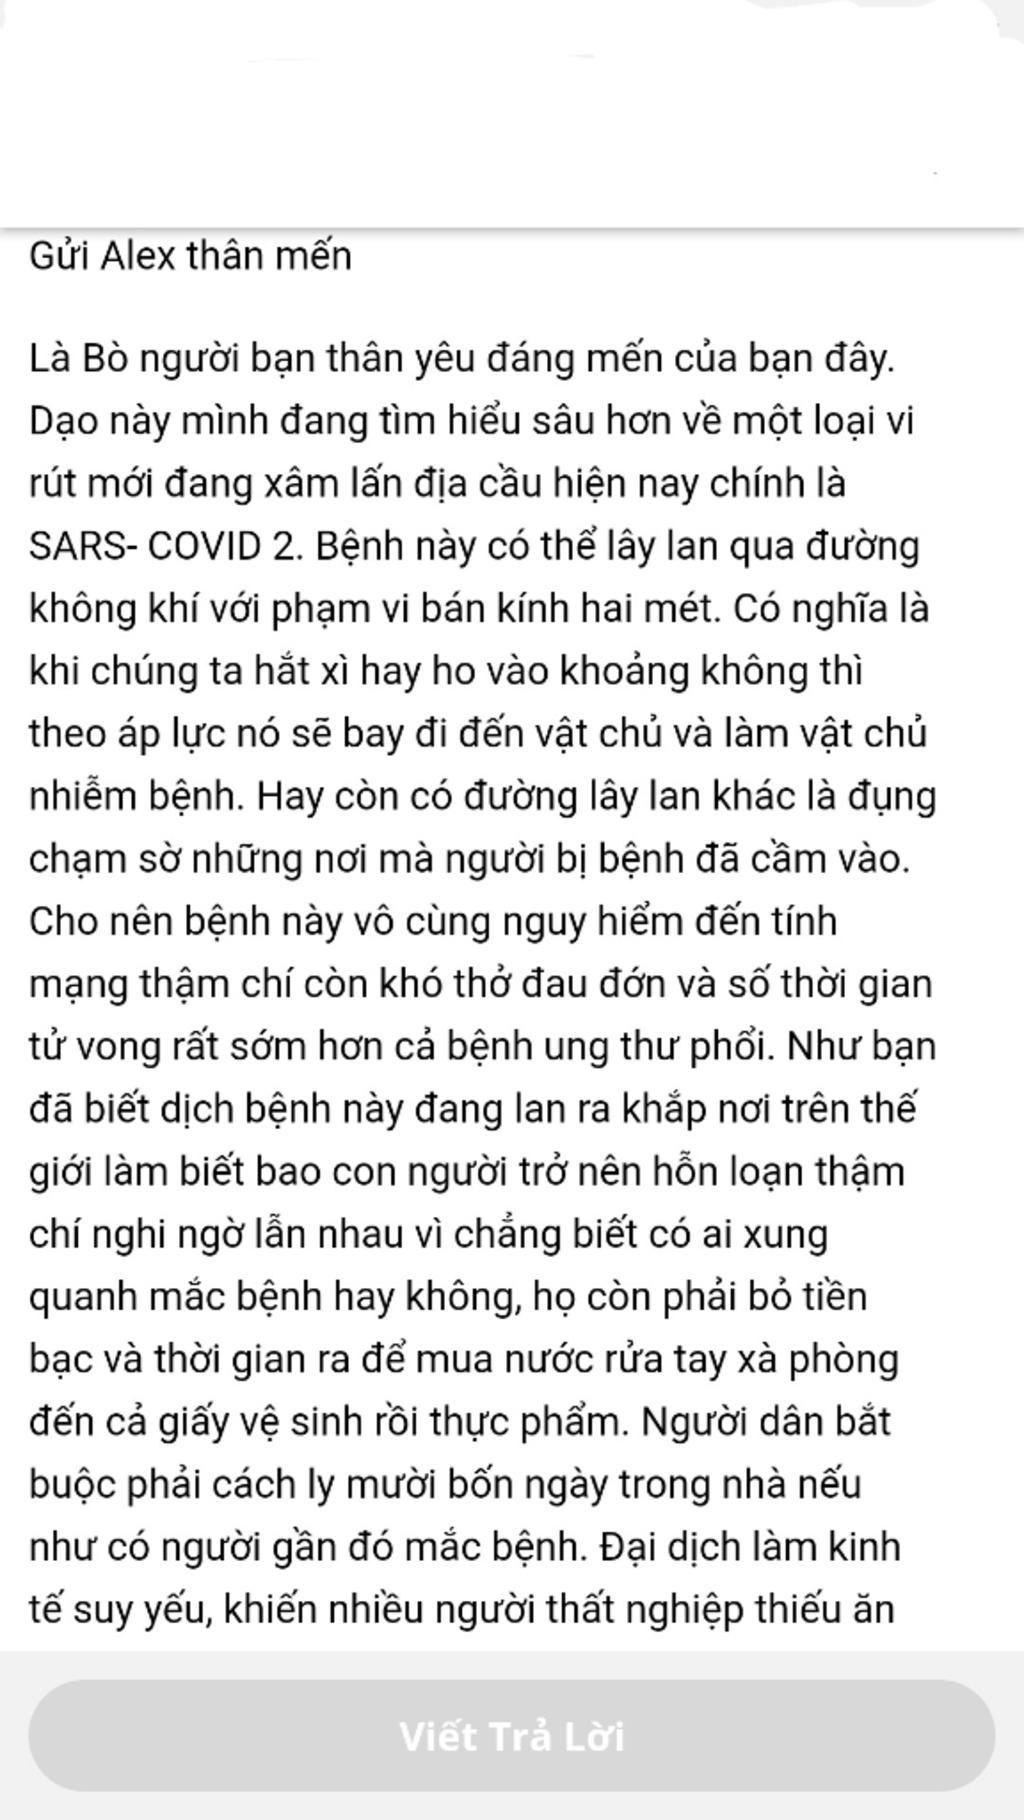 em-hay-viet-mot-bai-van-thong-diep-gui-mot-nguoi-lon-ve-the-gioi-chung-ta-dang-song-cac-ban-khon